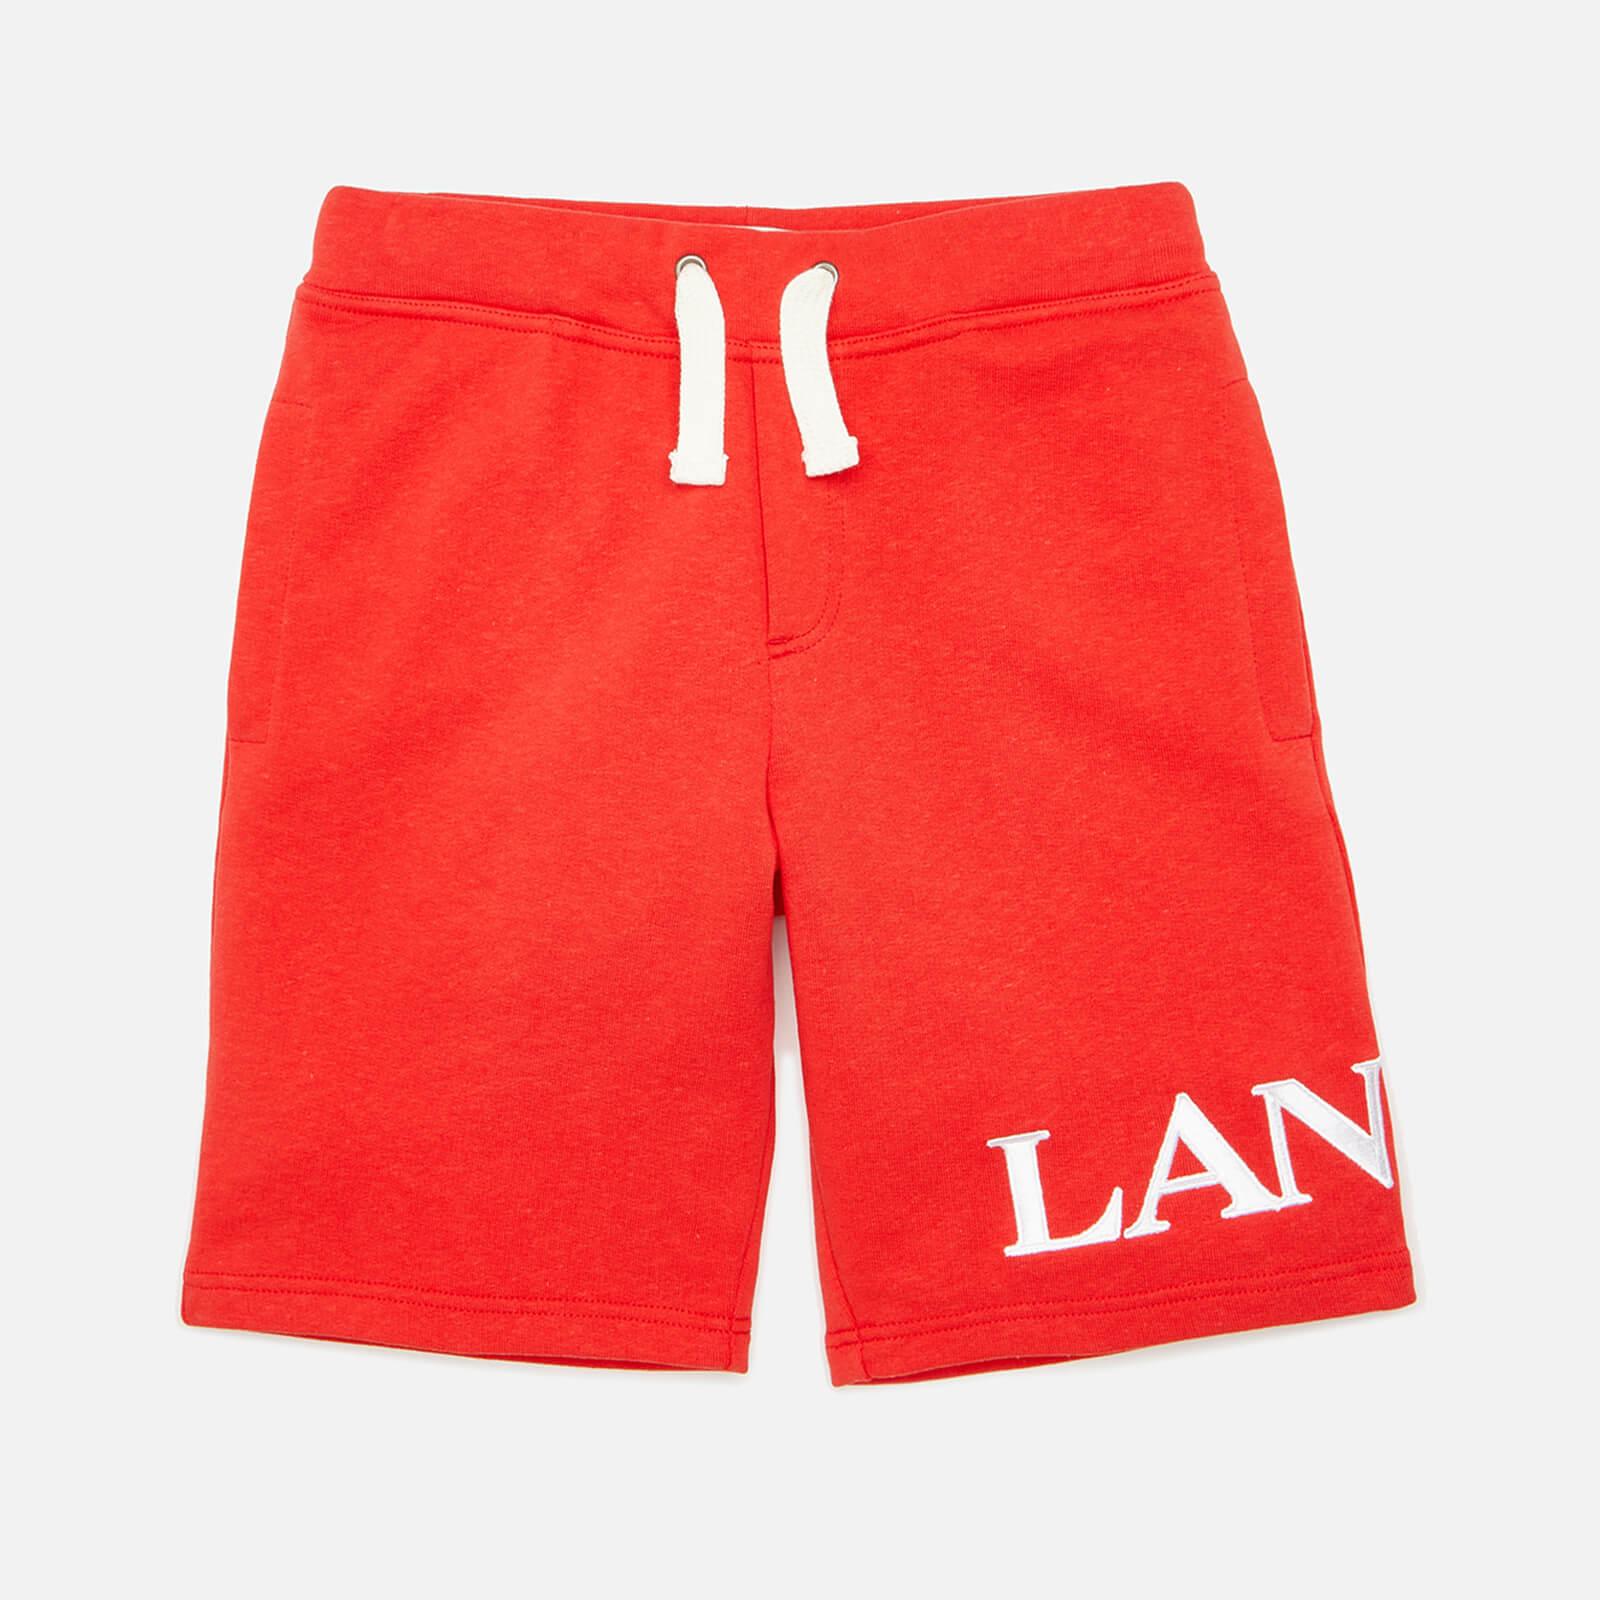 Lanvin Boys' Logo Shorts - Bright Red - 6 Years